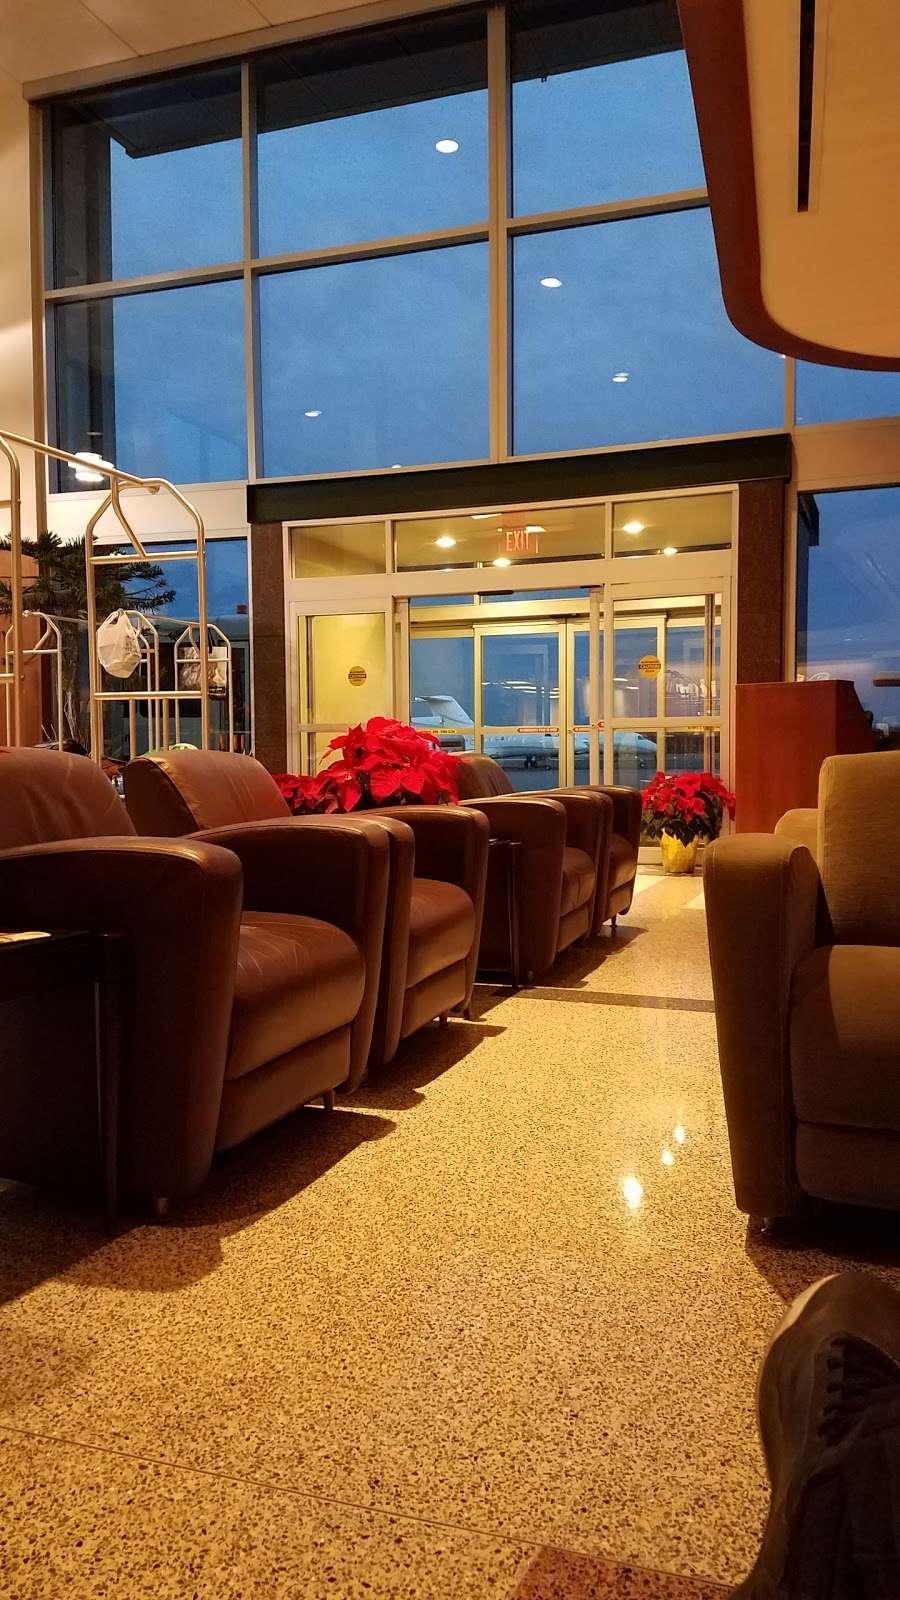 Meridian - airport  | Photo 6 of 10 | Address: 485 Industrial Ave, Teterboro, NJ 07608, USA | Phone: (201) 288-5040